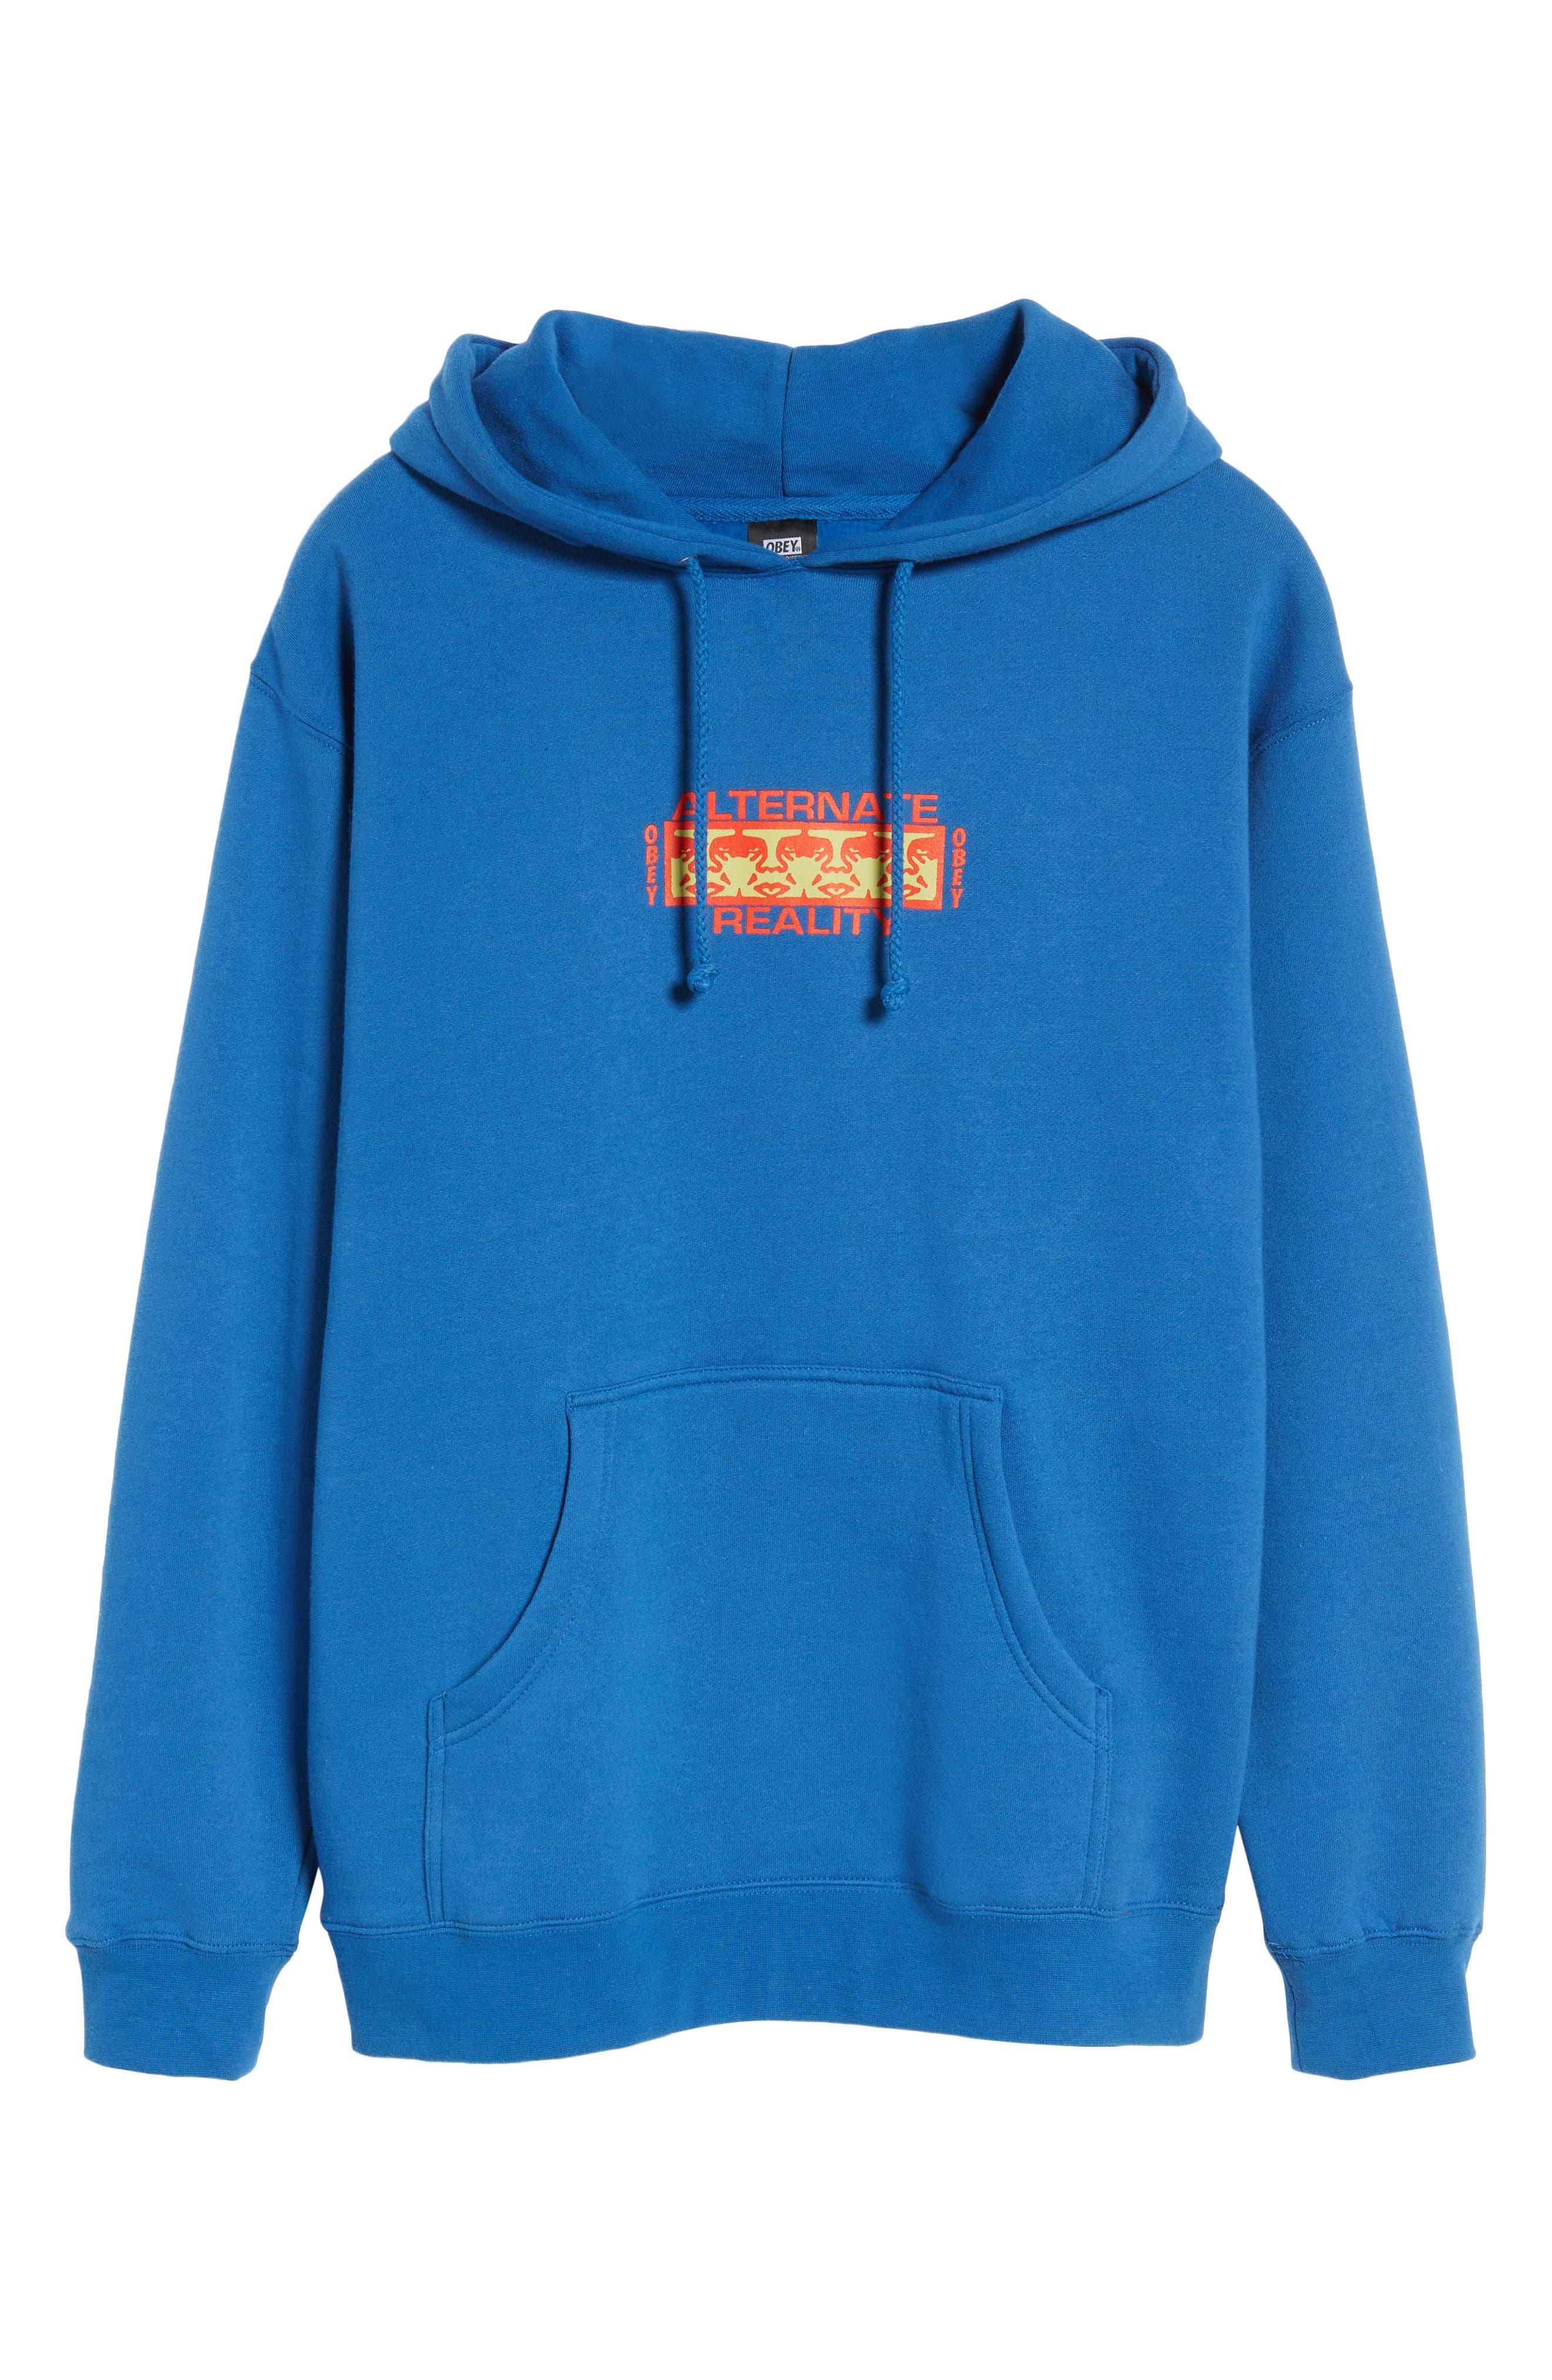 Alternate Reality Hoodie Sweatshirt,                             Alternate thumbnail 6, color,                             Royal Blue